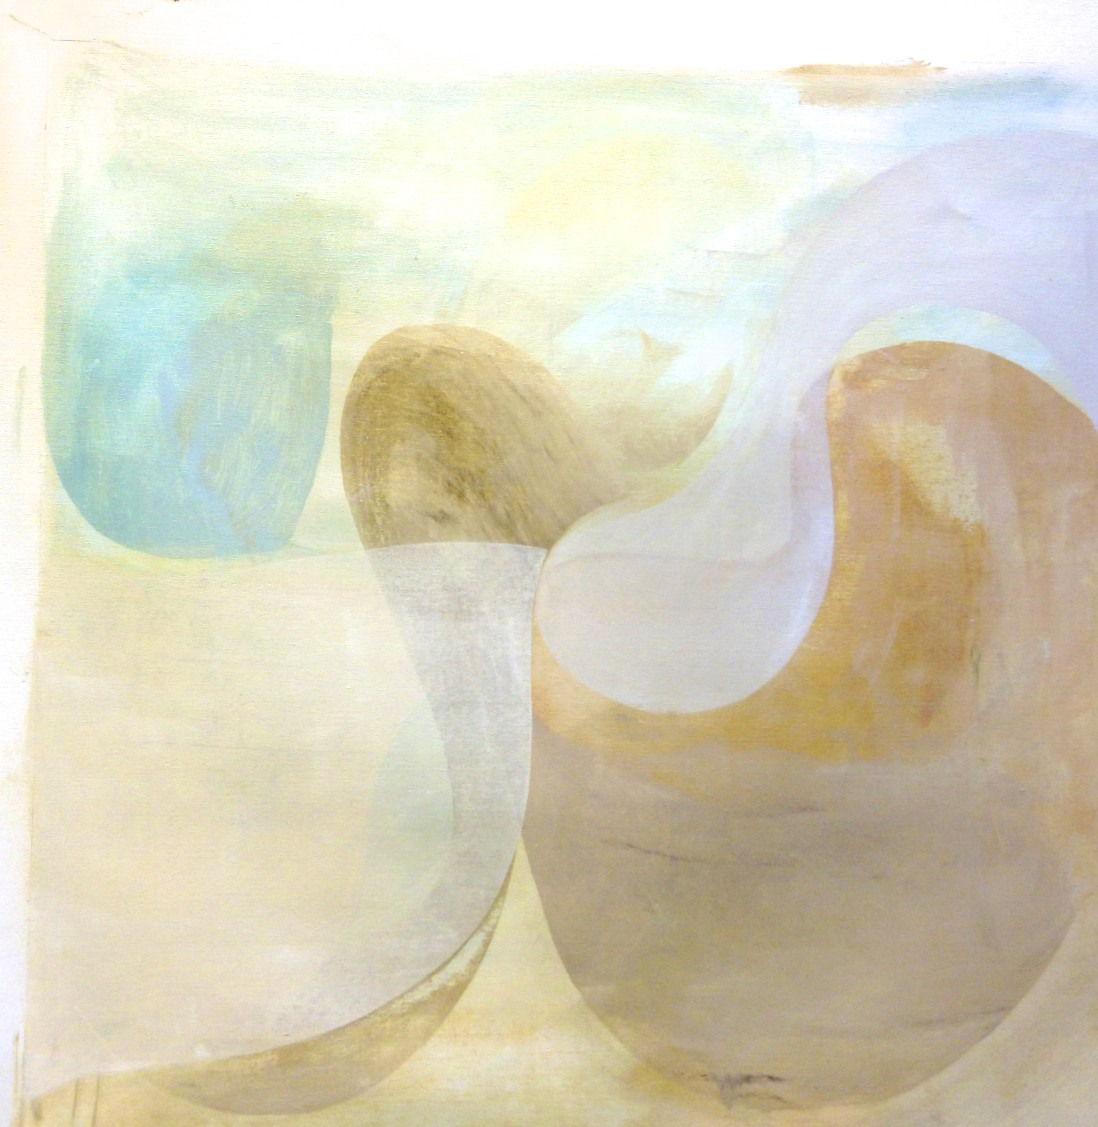 Spiral Swish, Commission - Kaiser Permanente - Hillsboro, OR, 2012, copyright victoriajobnson.net